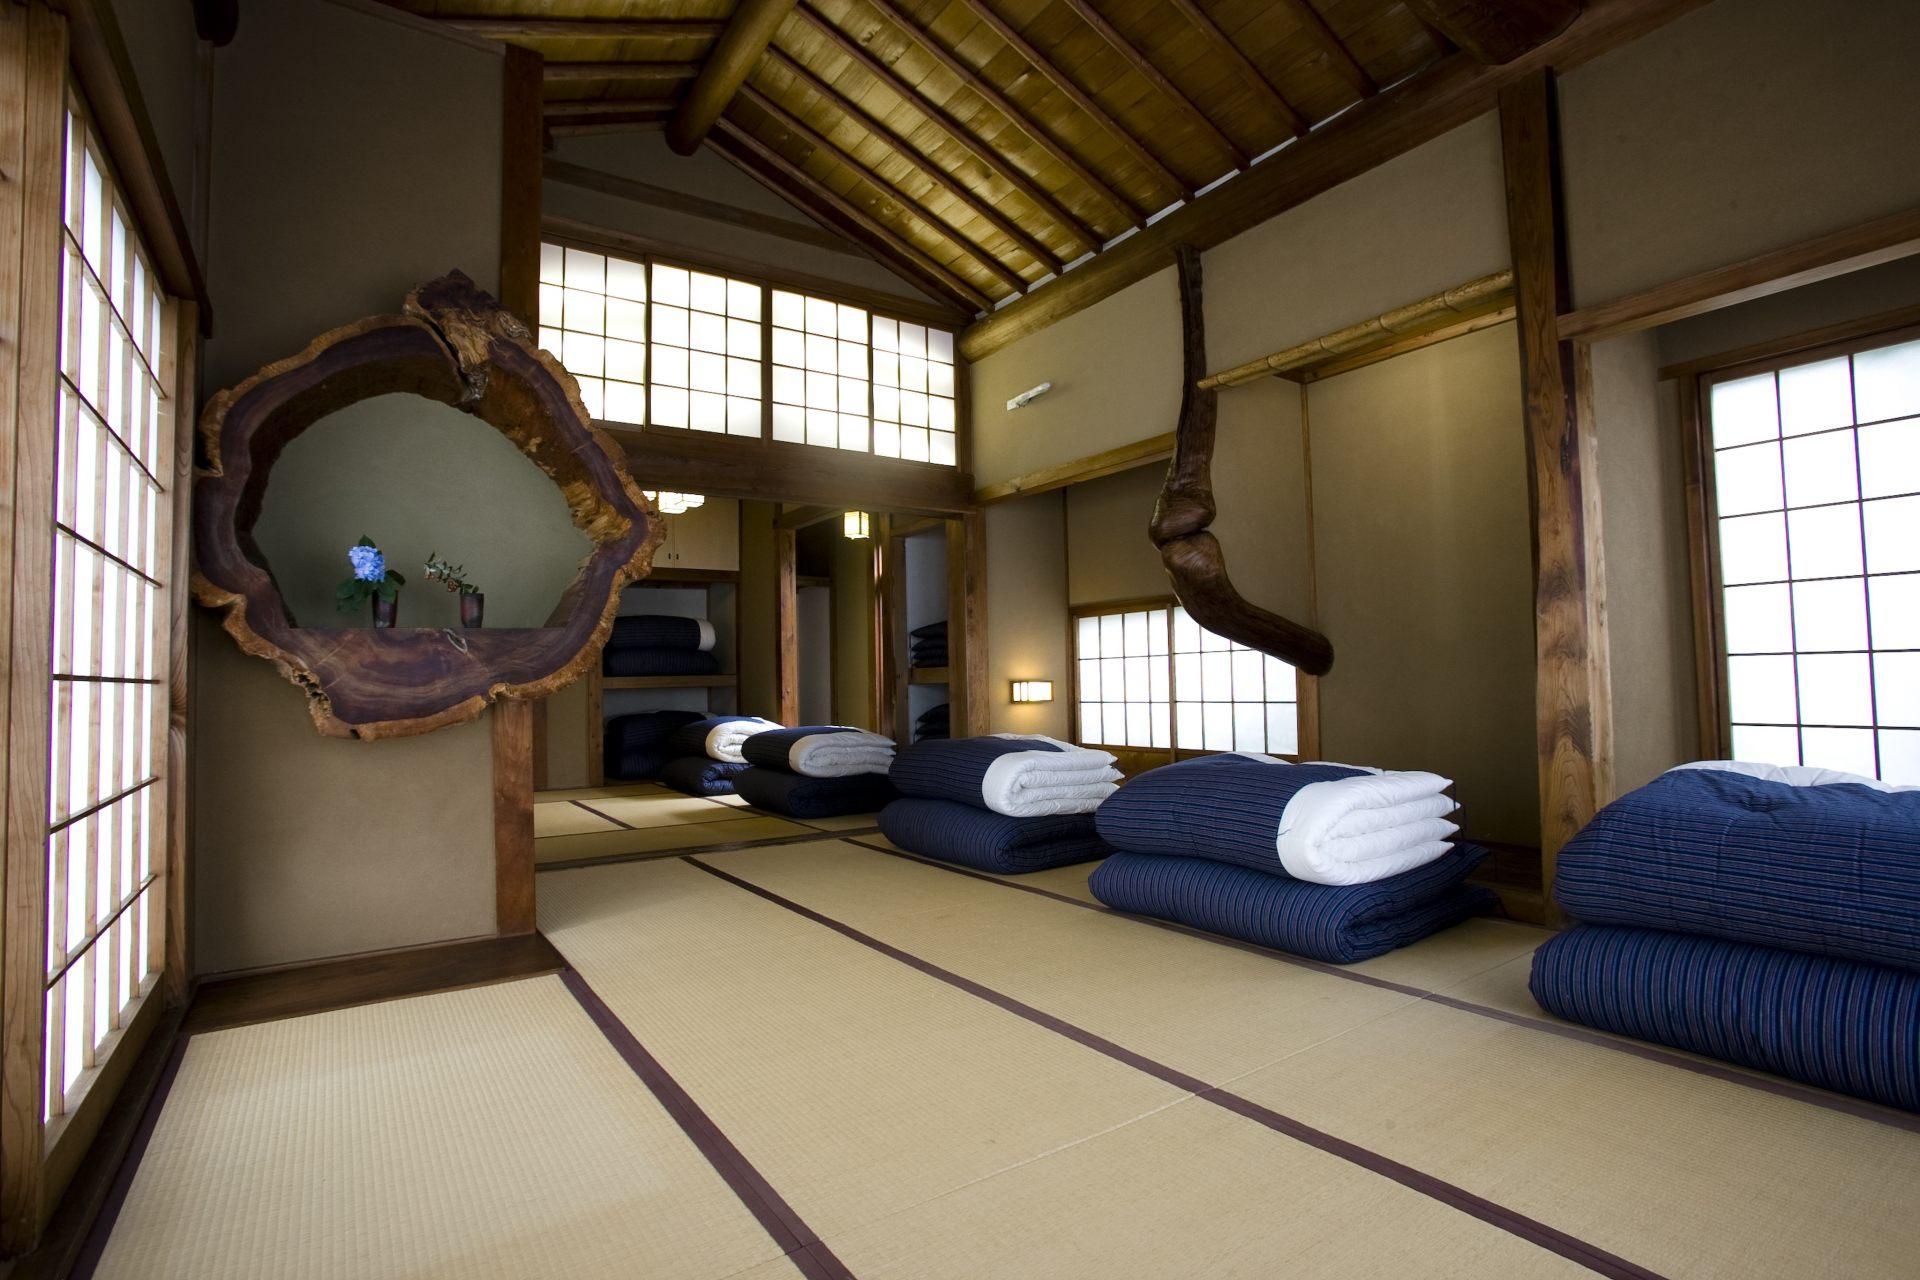 Men's Dormitory